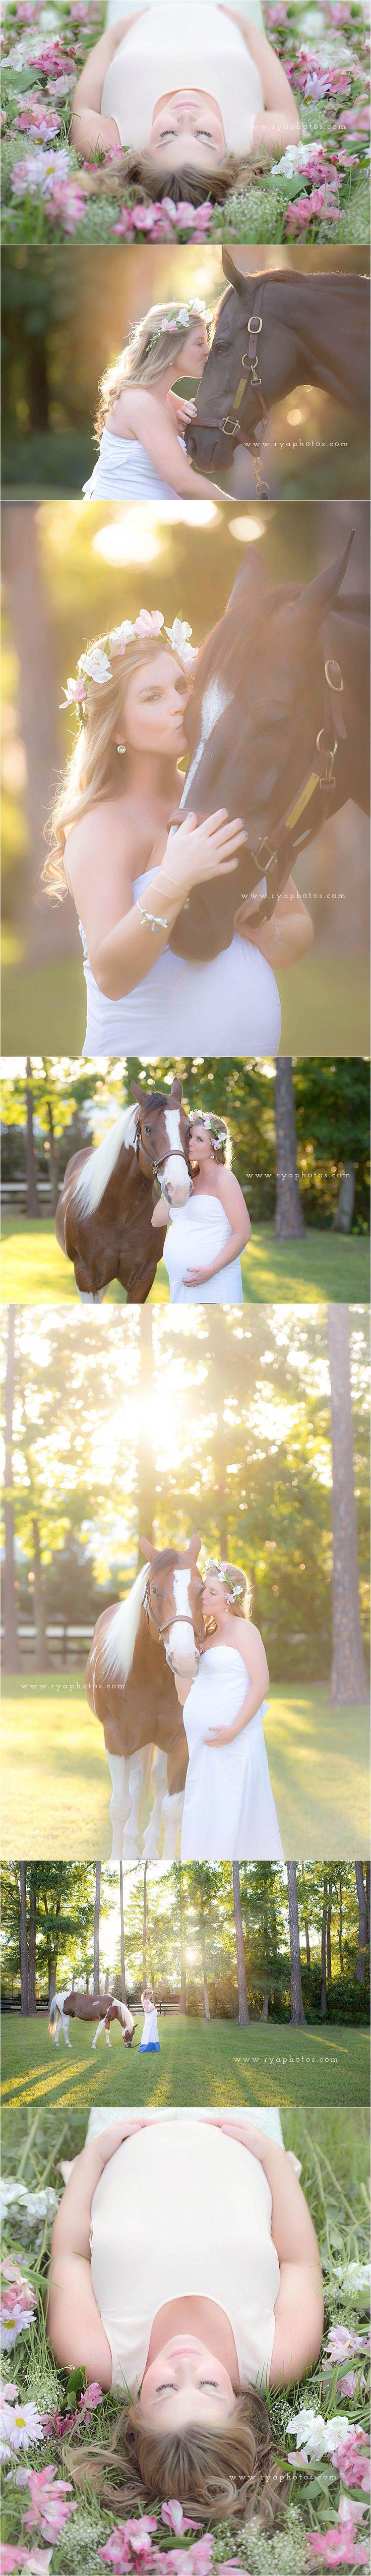 summer maternity photo shoot with flowers and horses- jacksonville's maternity photographer via: http://ryaphotos.com/newborn/magical-summer-shoot-jacksonvilles-maternity-photographer/